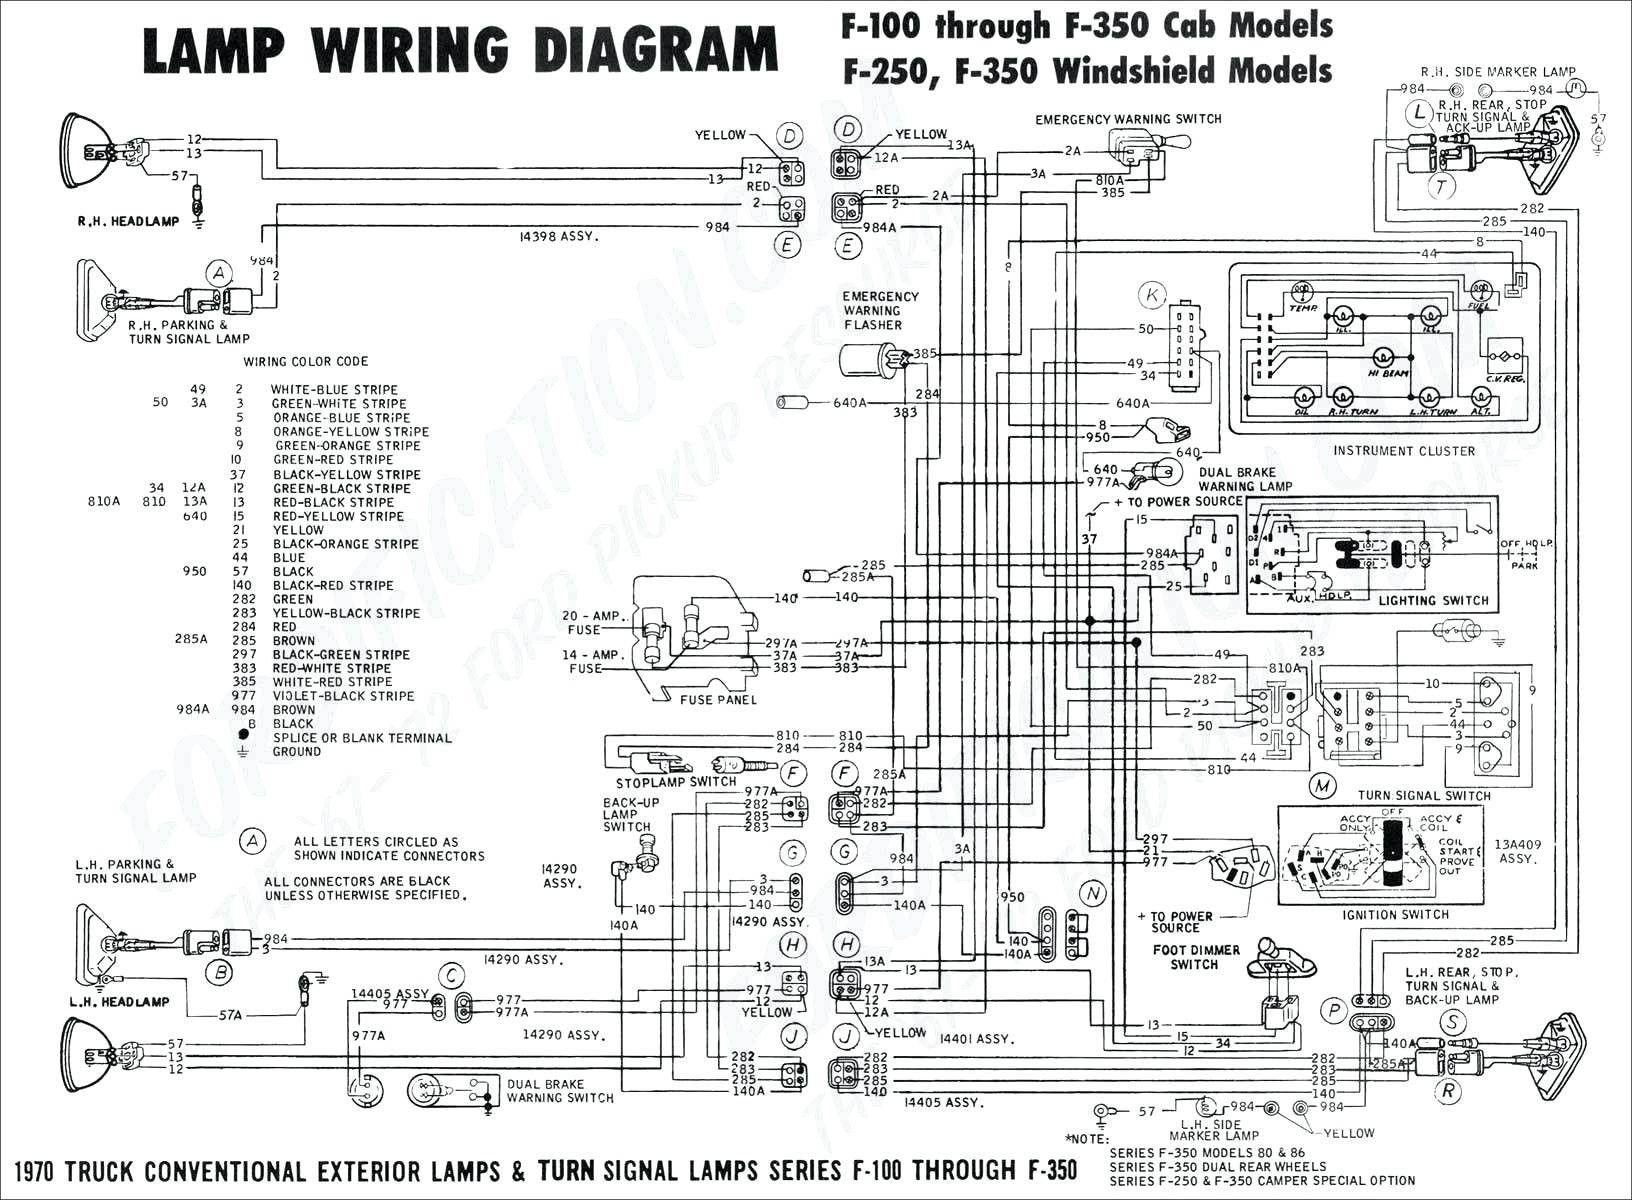 2003 Ford Ranger 2 3 Engine Diagram Honda Accord Nissan Maxima Honda Civic